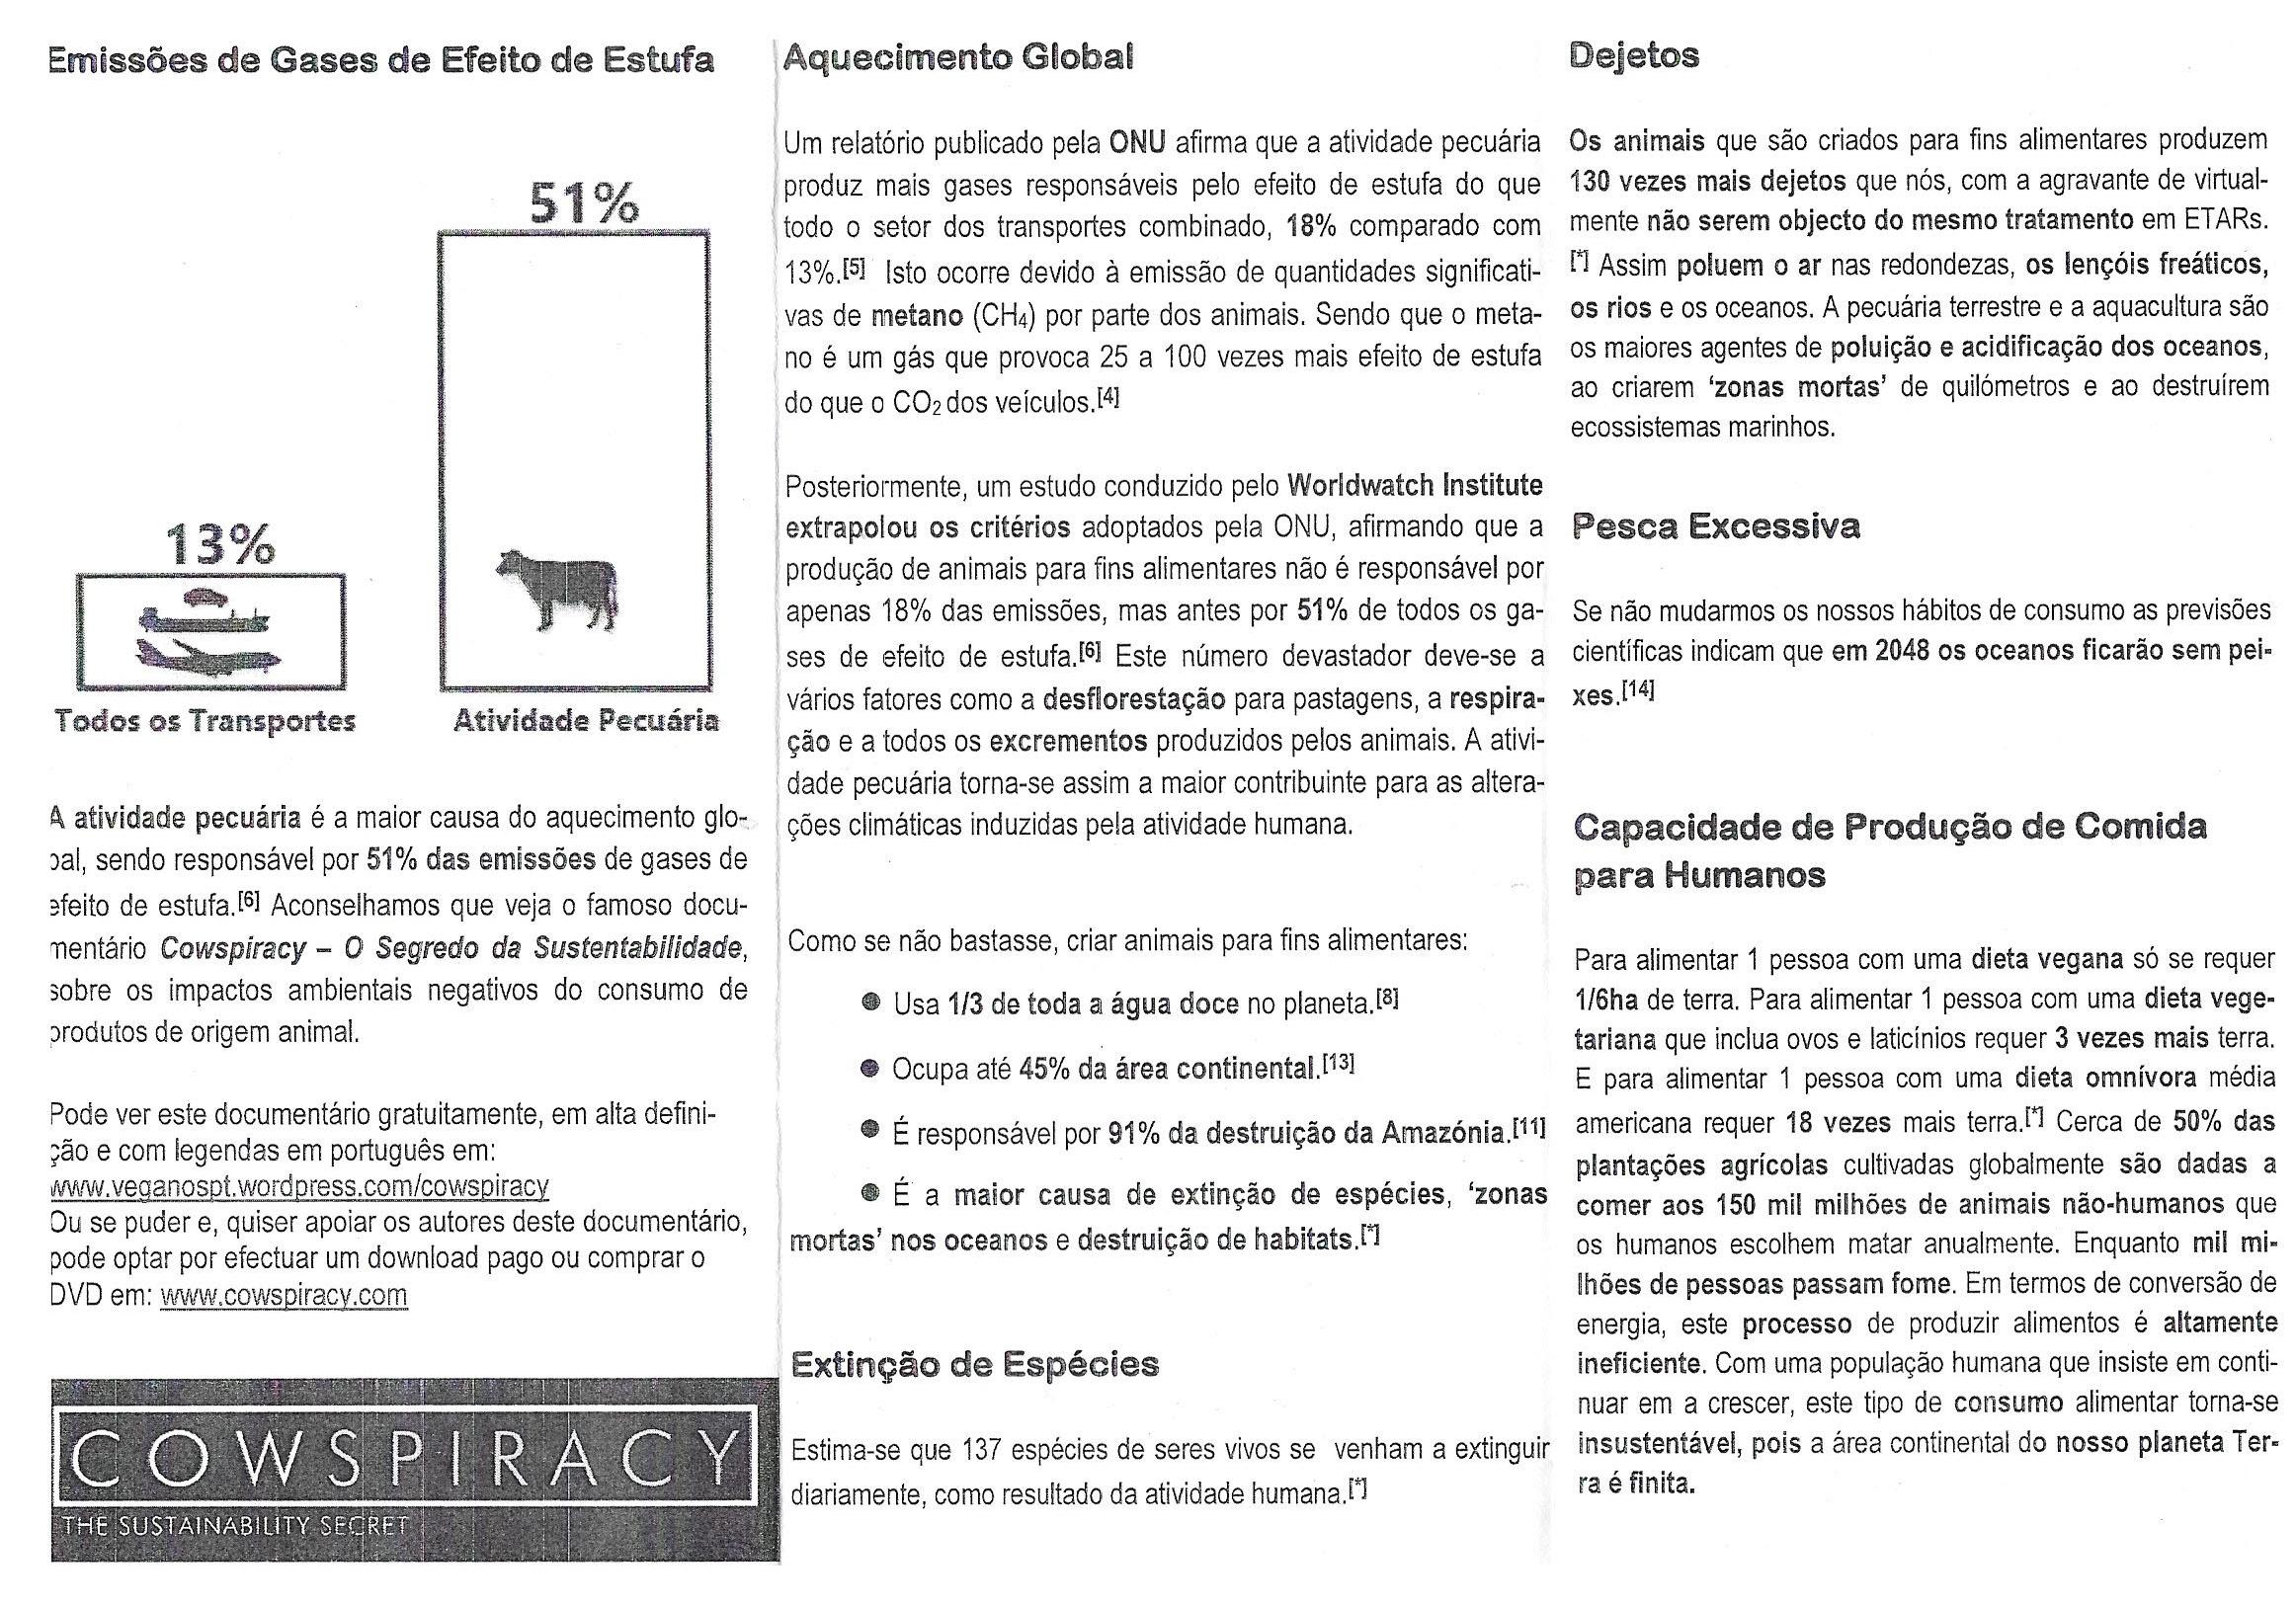 cowspiracy2